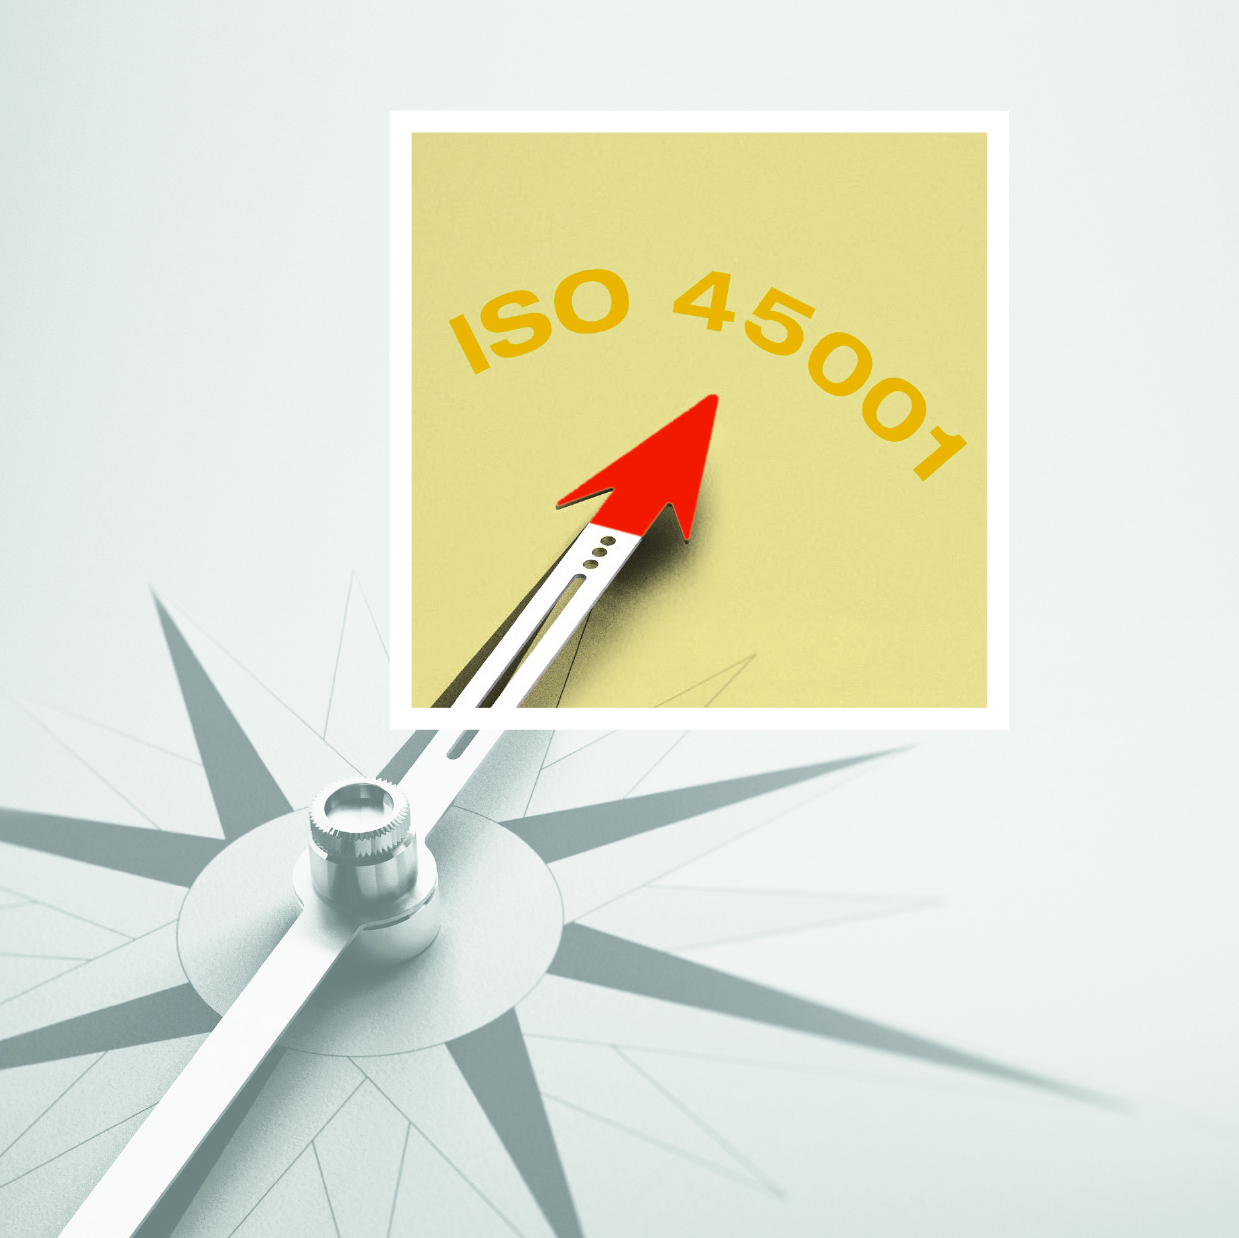 ISO 45001:2018 replaces OHSAS 18001 - Quality Austria